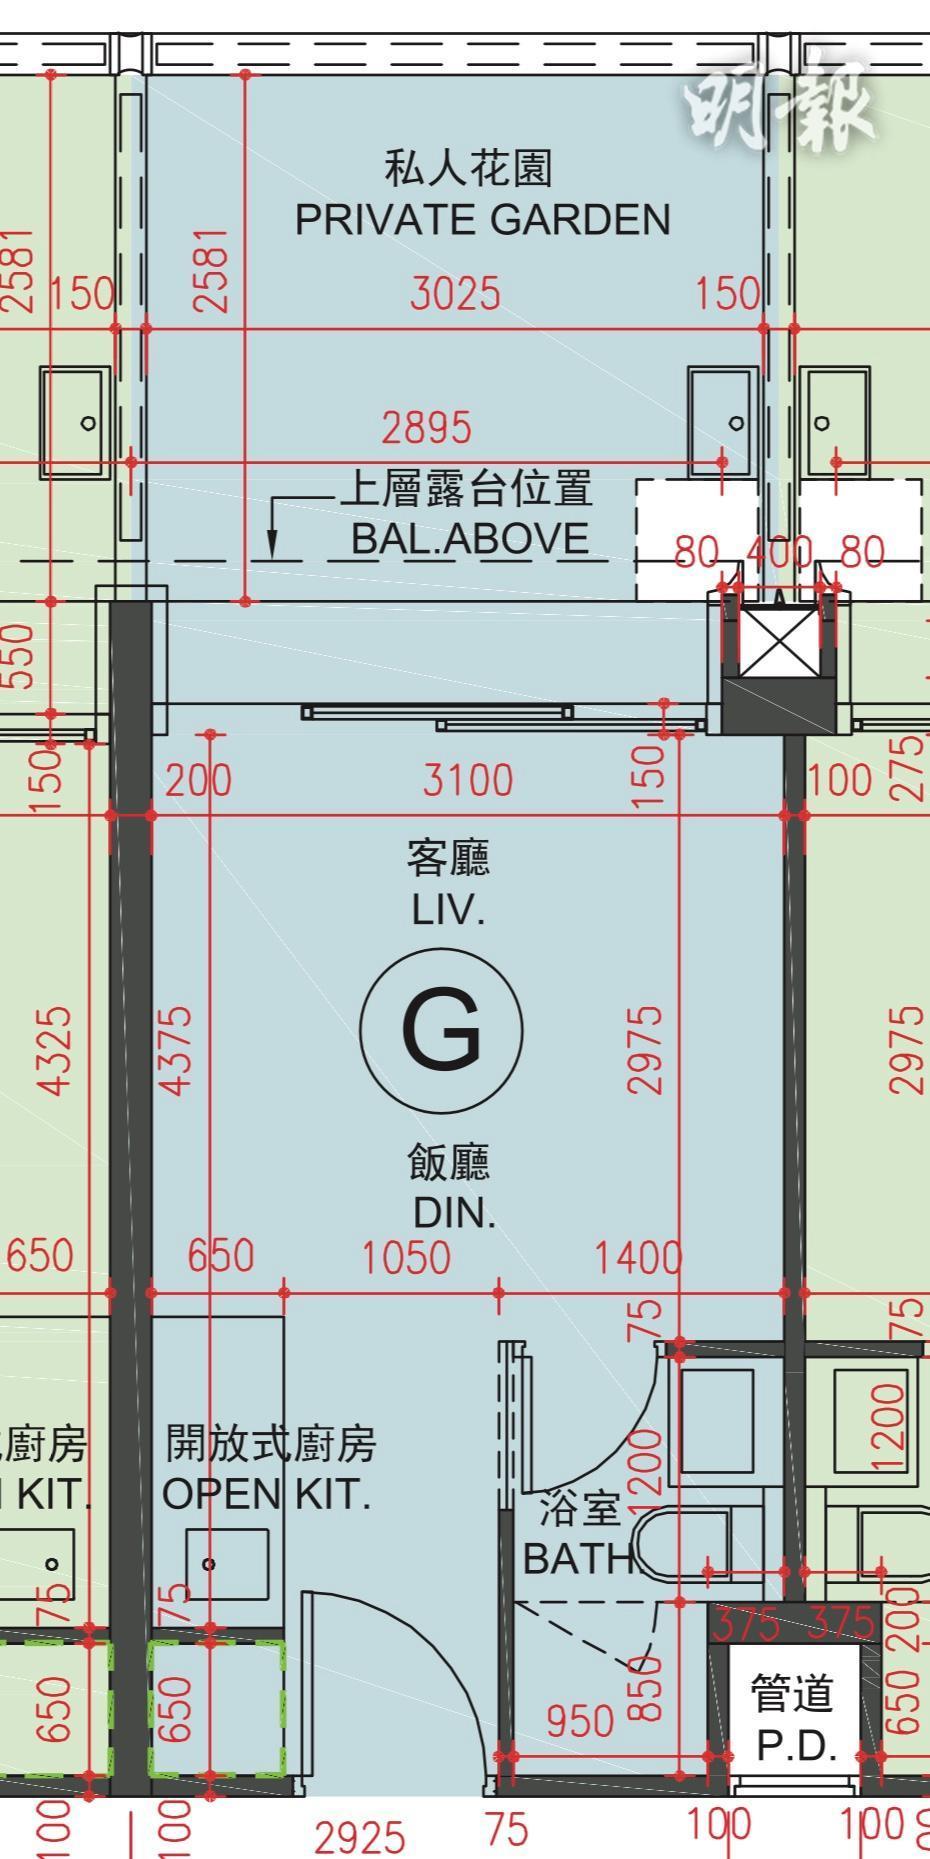 THE HENLEY I 低座D座地下實用186方呎連95方呎花園,G室開放式特色戶。